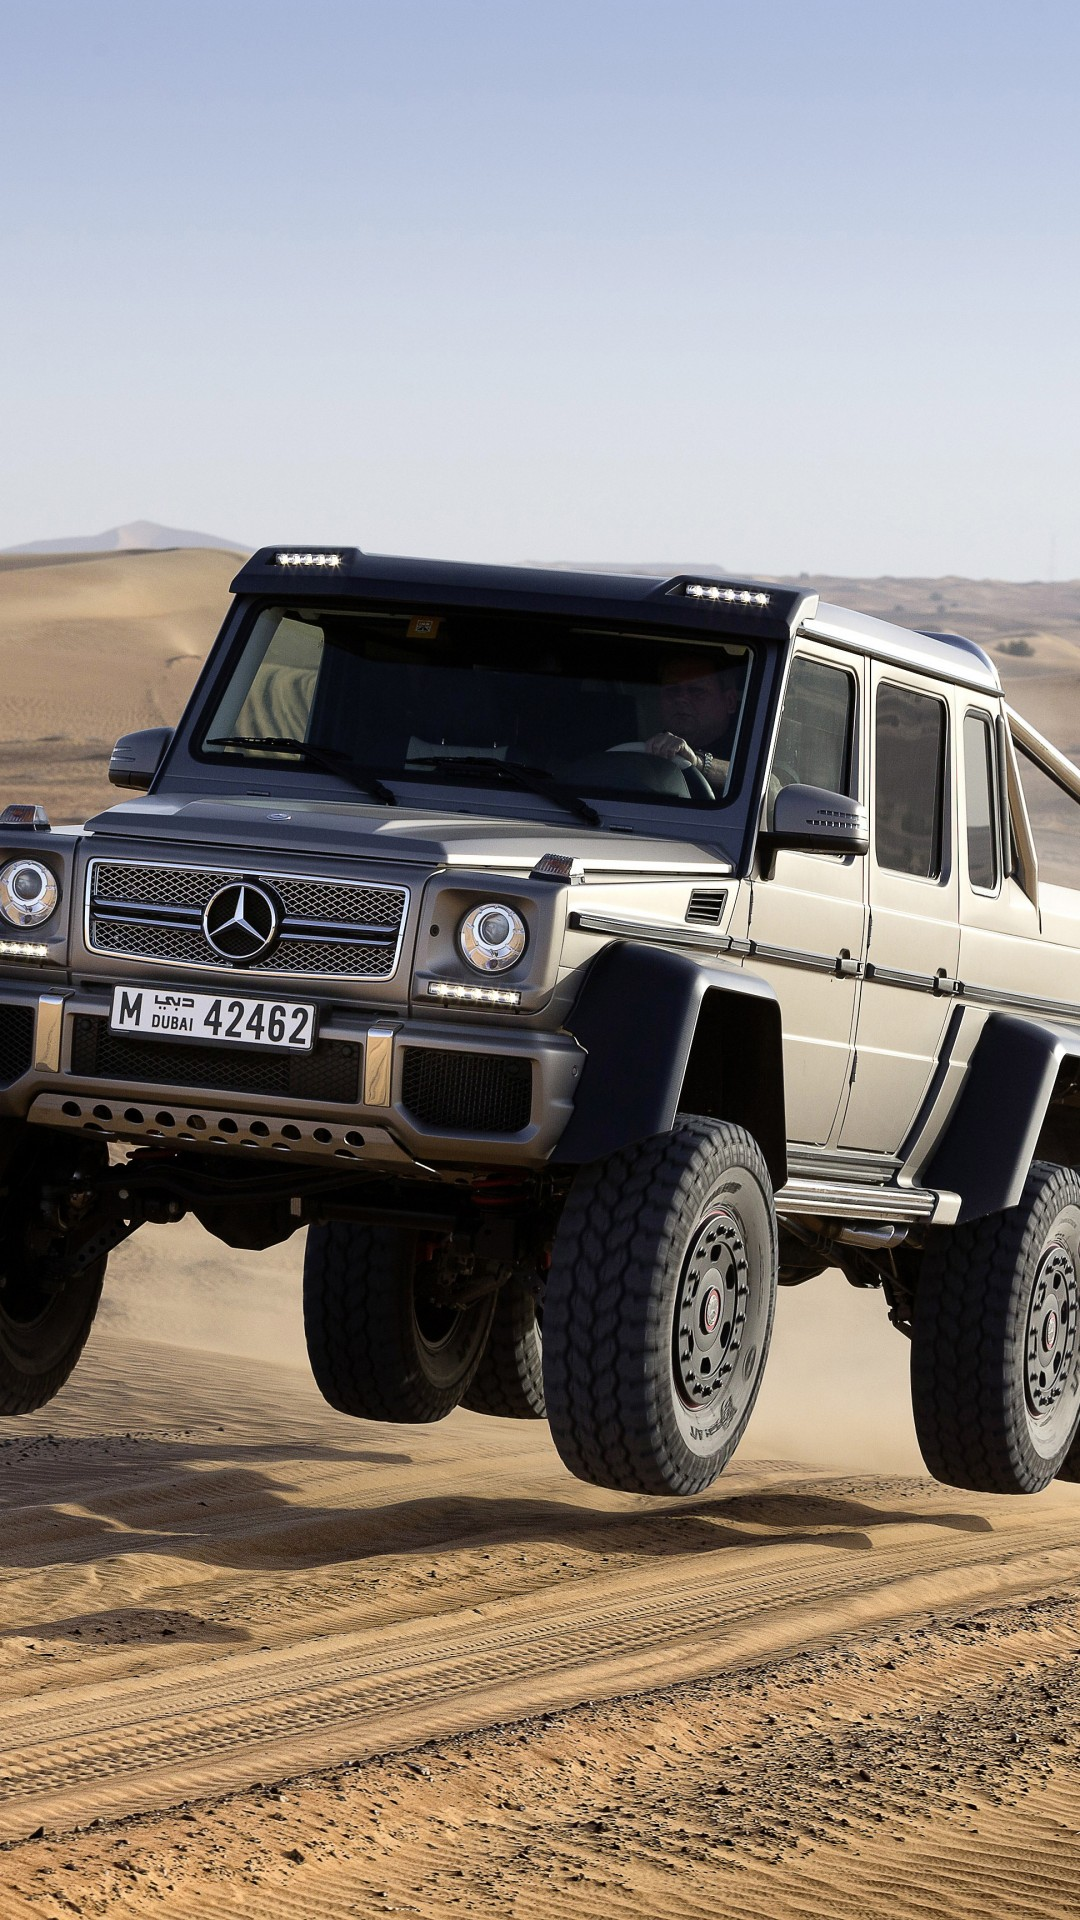 Range Rover Sport >> Wallpaper Mercedes-Benz G 63 AMG 6x6, SUV, Mercedes